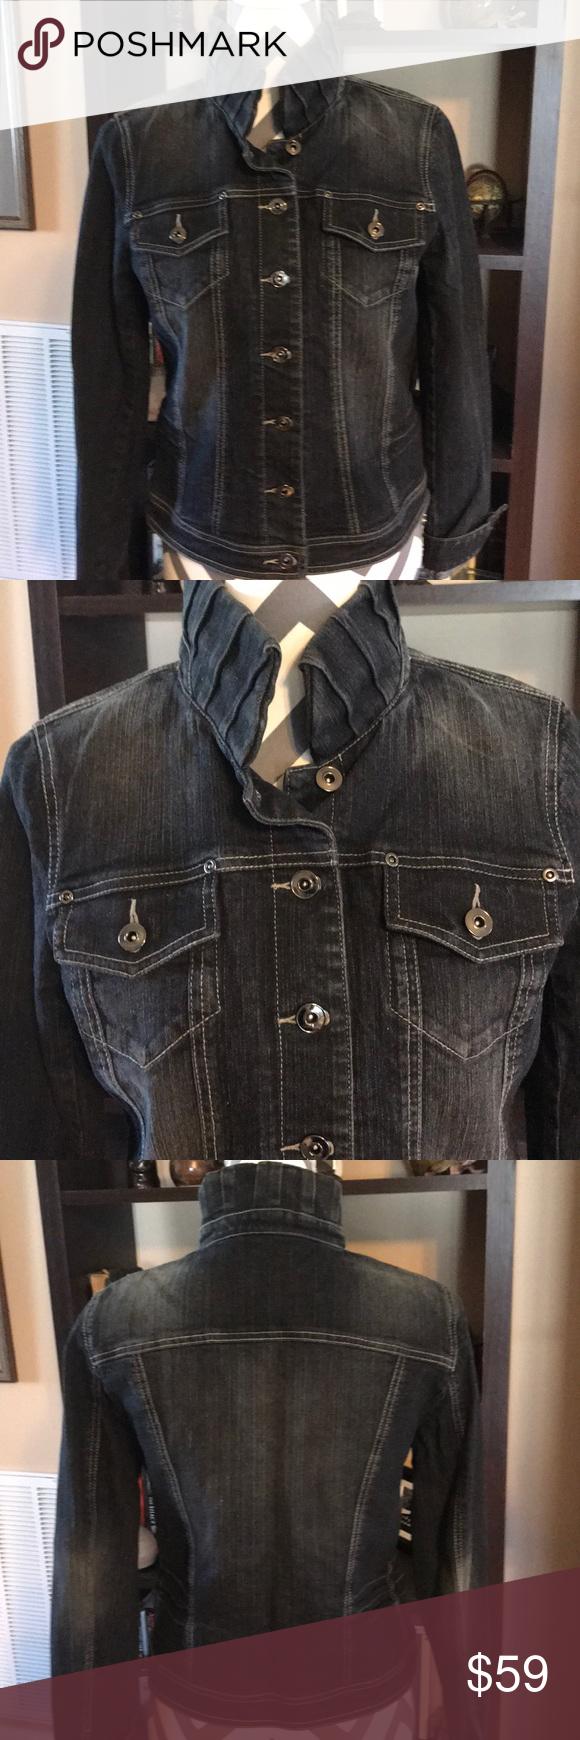 Etcetera Denim Jacket With Raised Collar Size 6 Denim Jacket Clothes Design Fashion Design [ 1740 x 580 Pixel ]